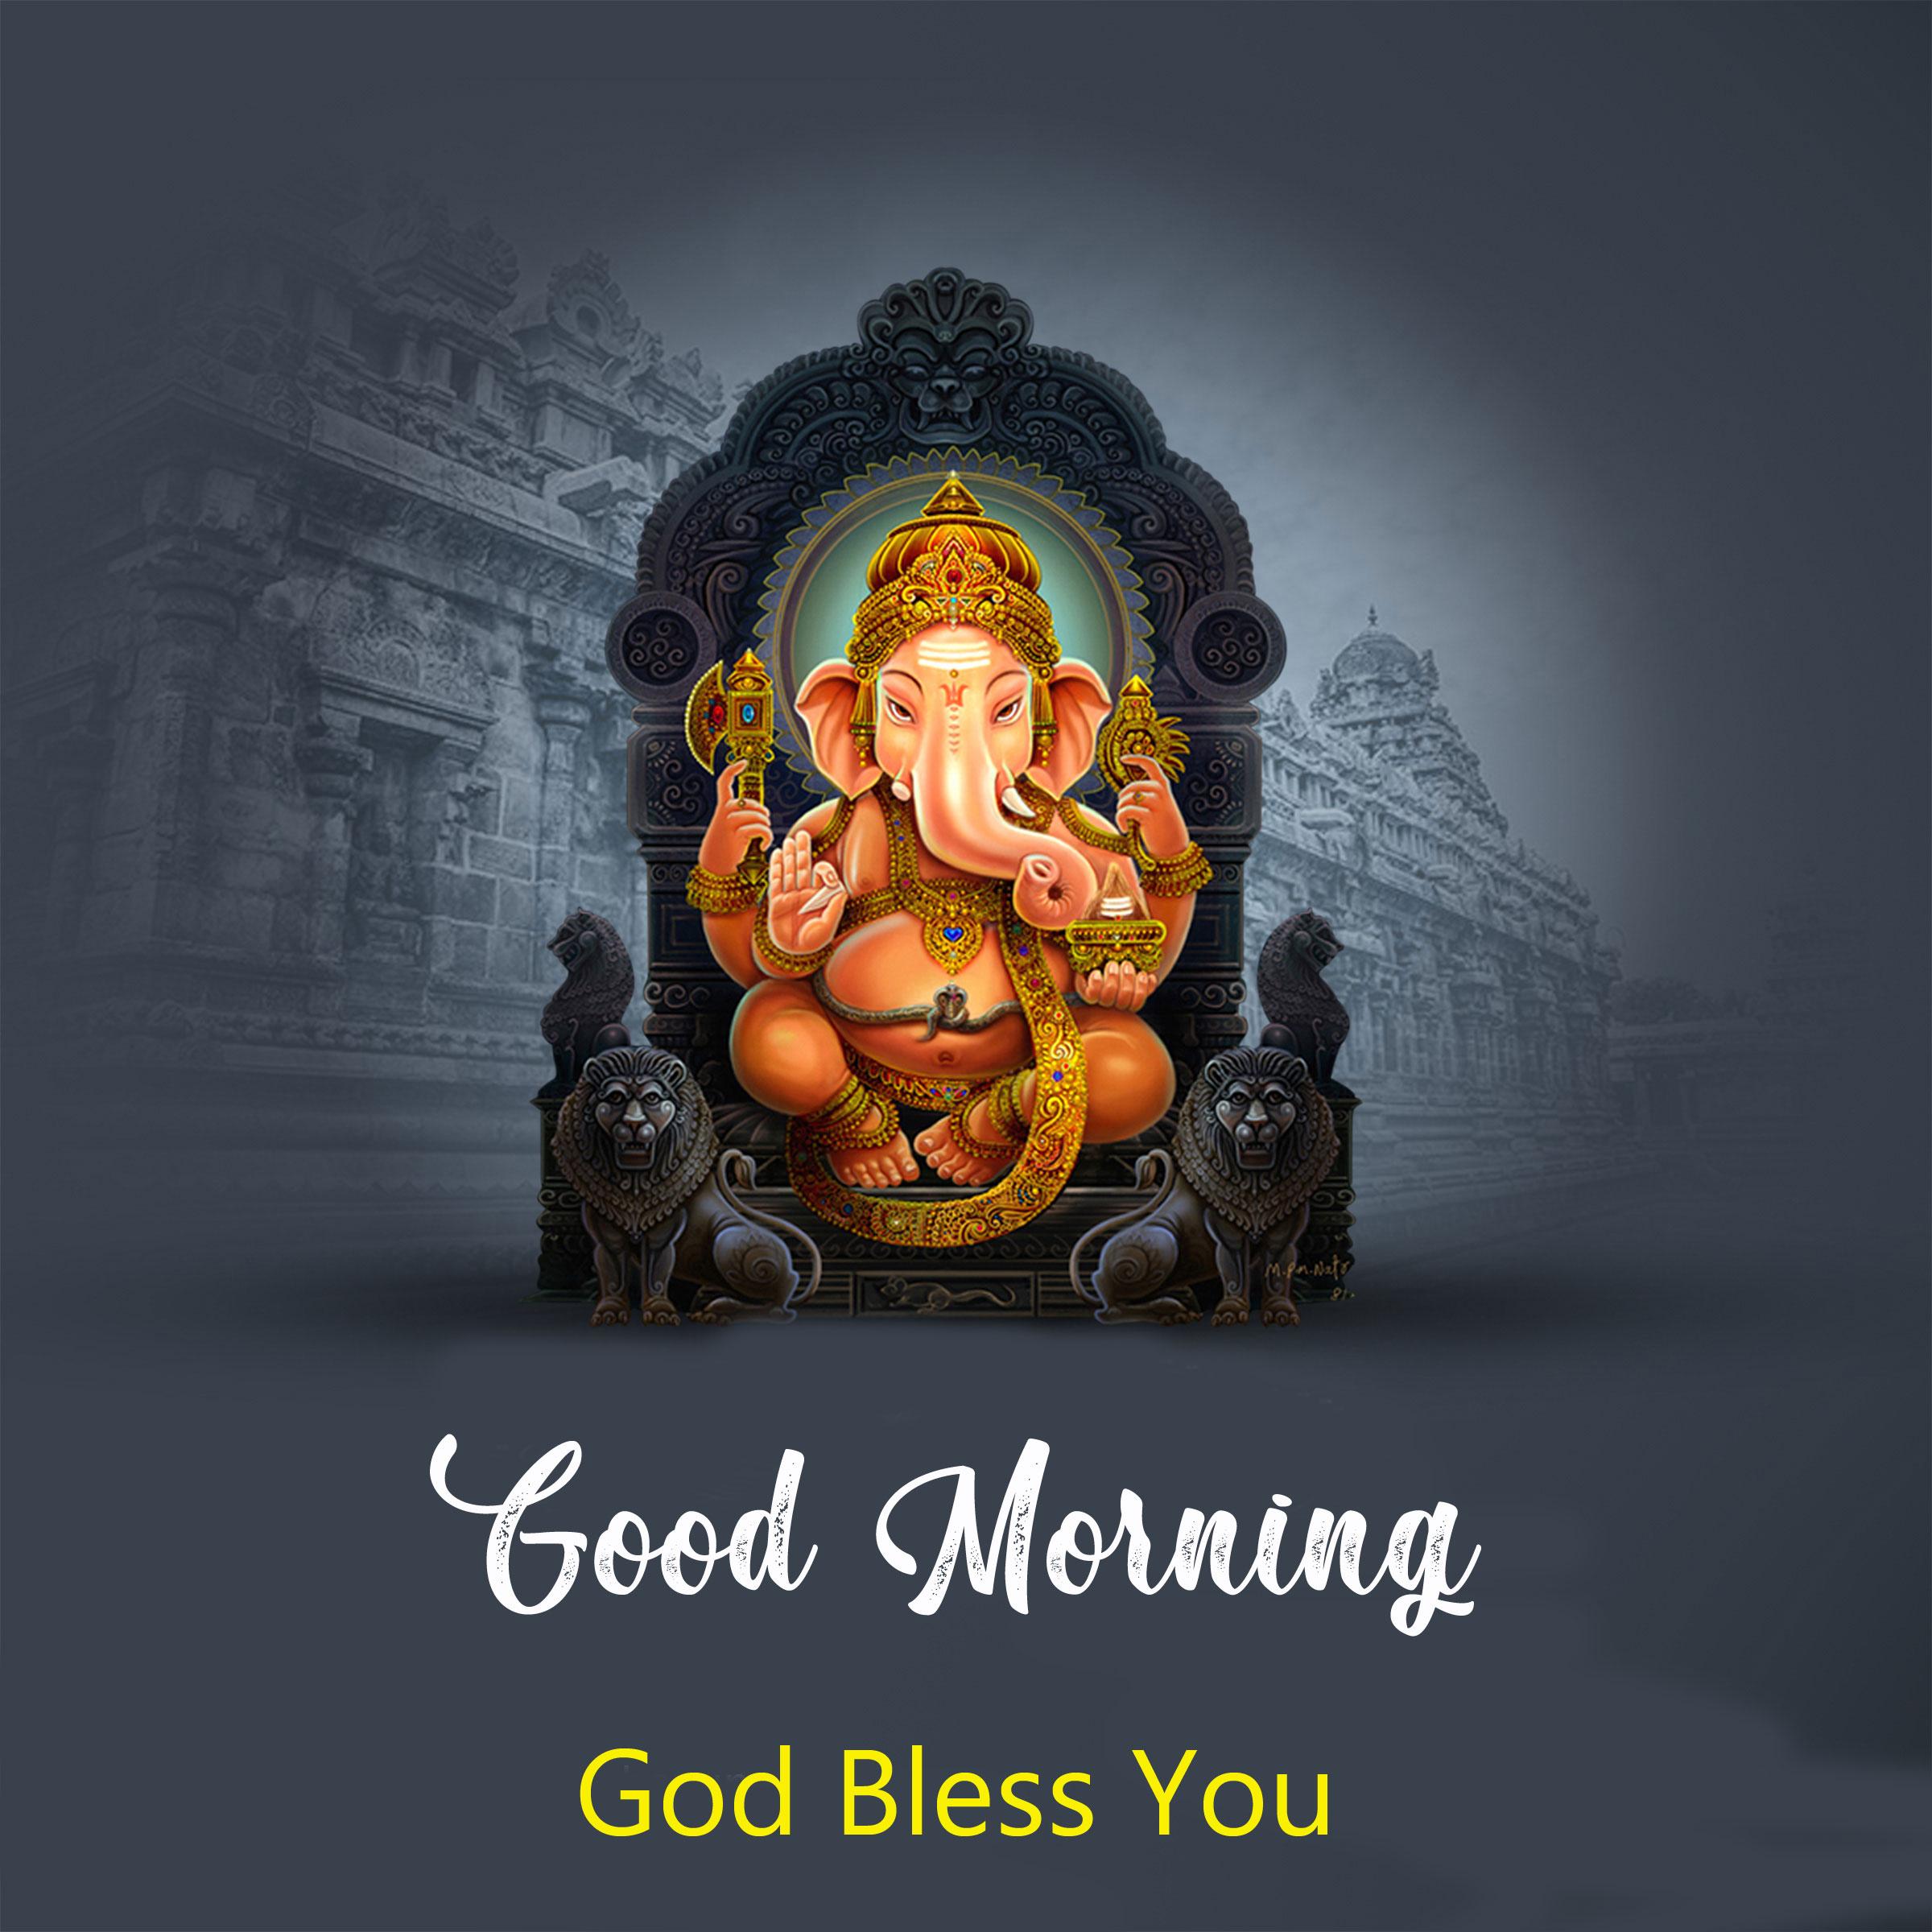 ganesha good morning images photo for hd